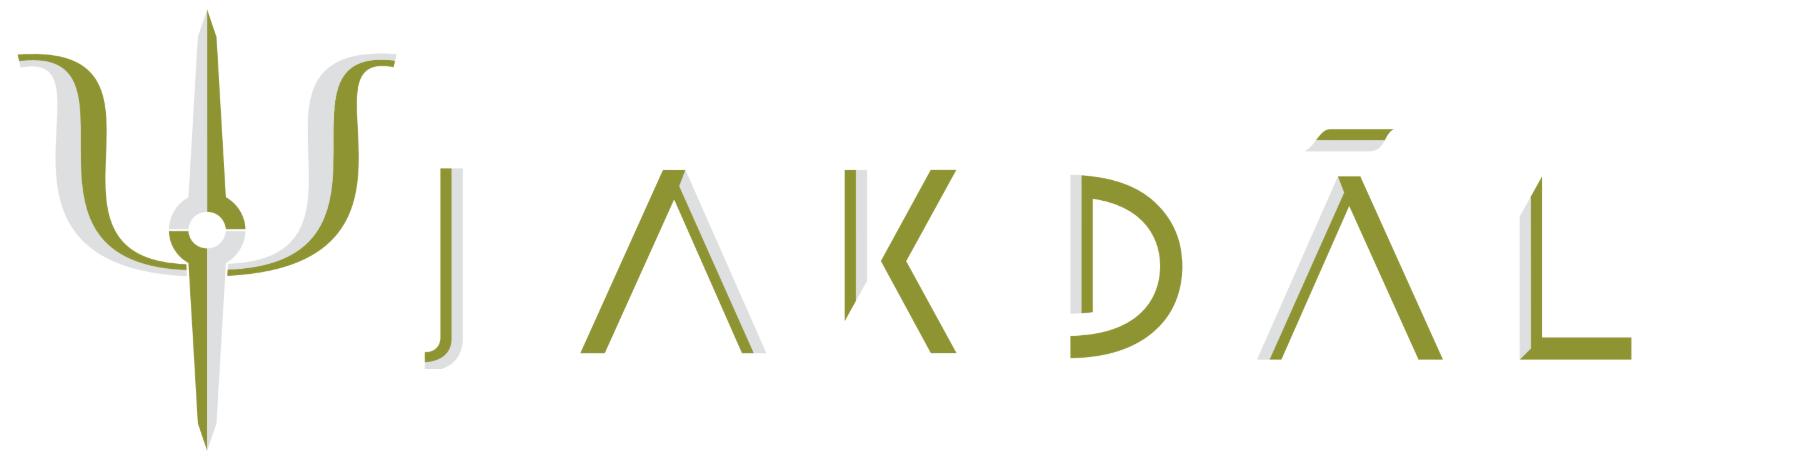 jak-dal.com